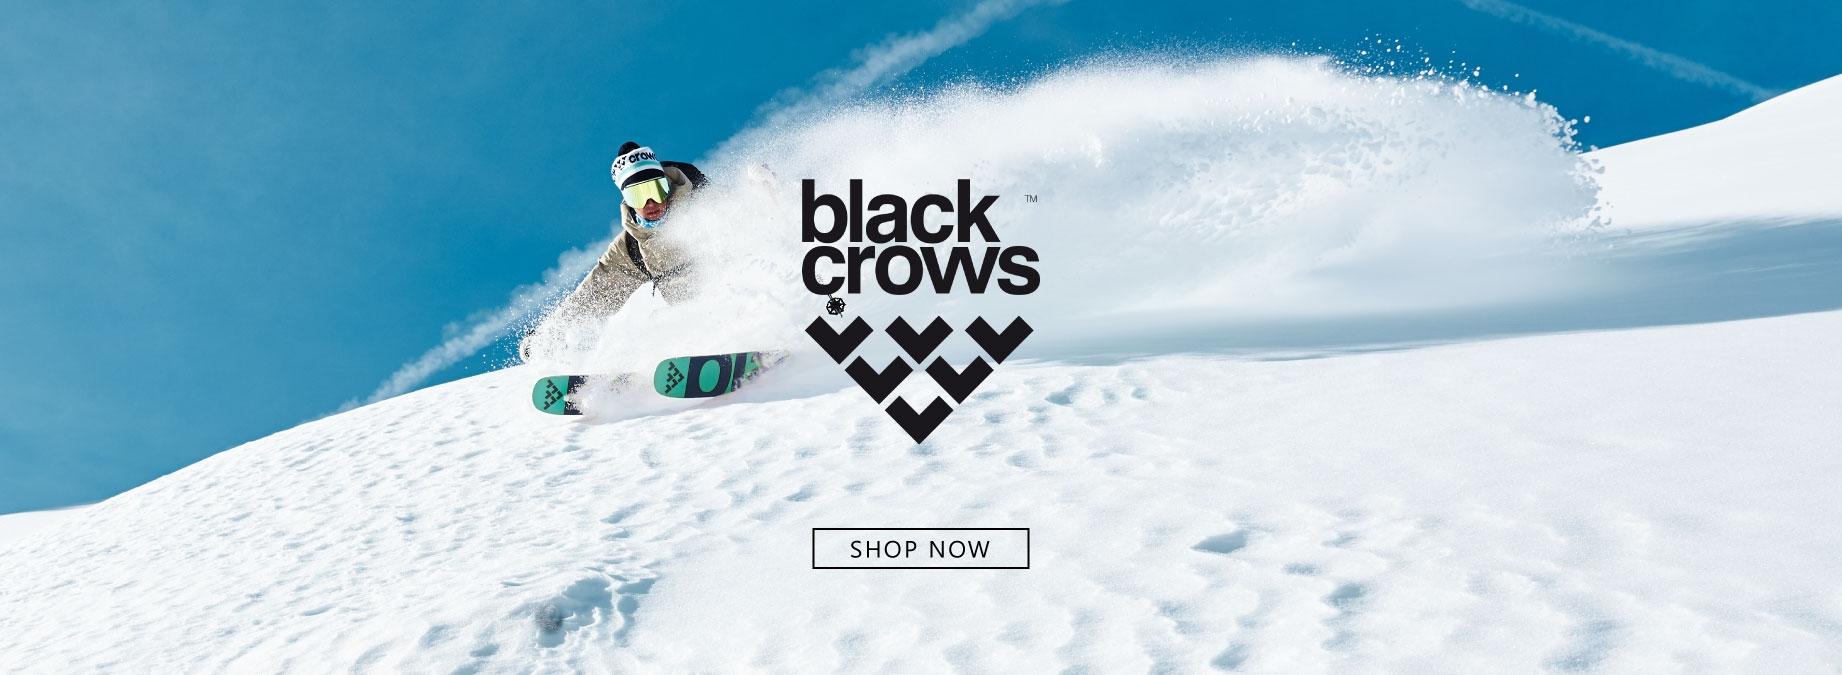 2020 Black Crows